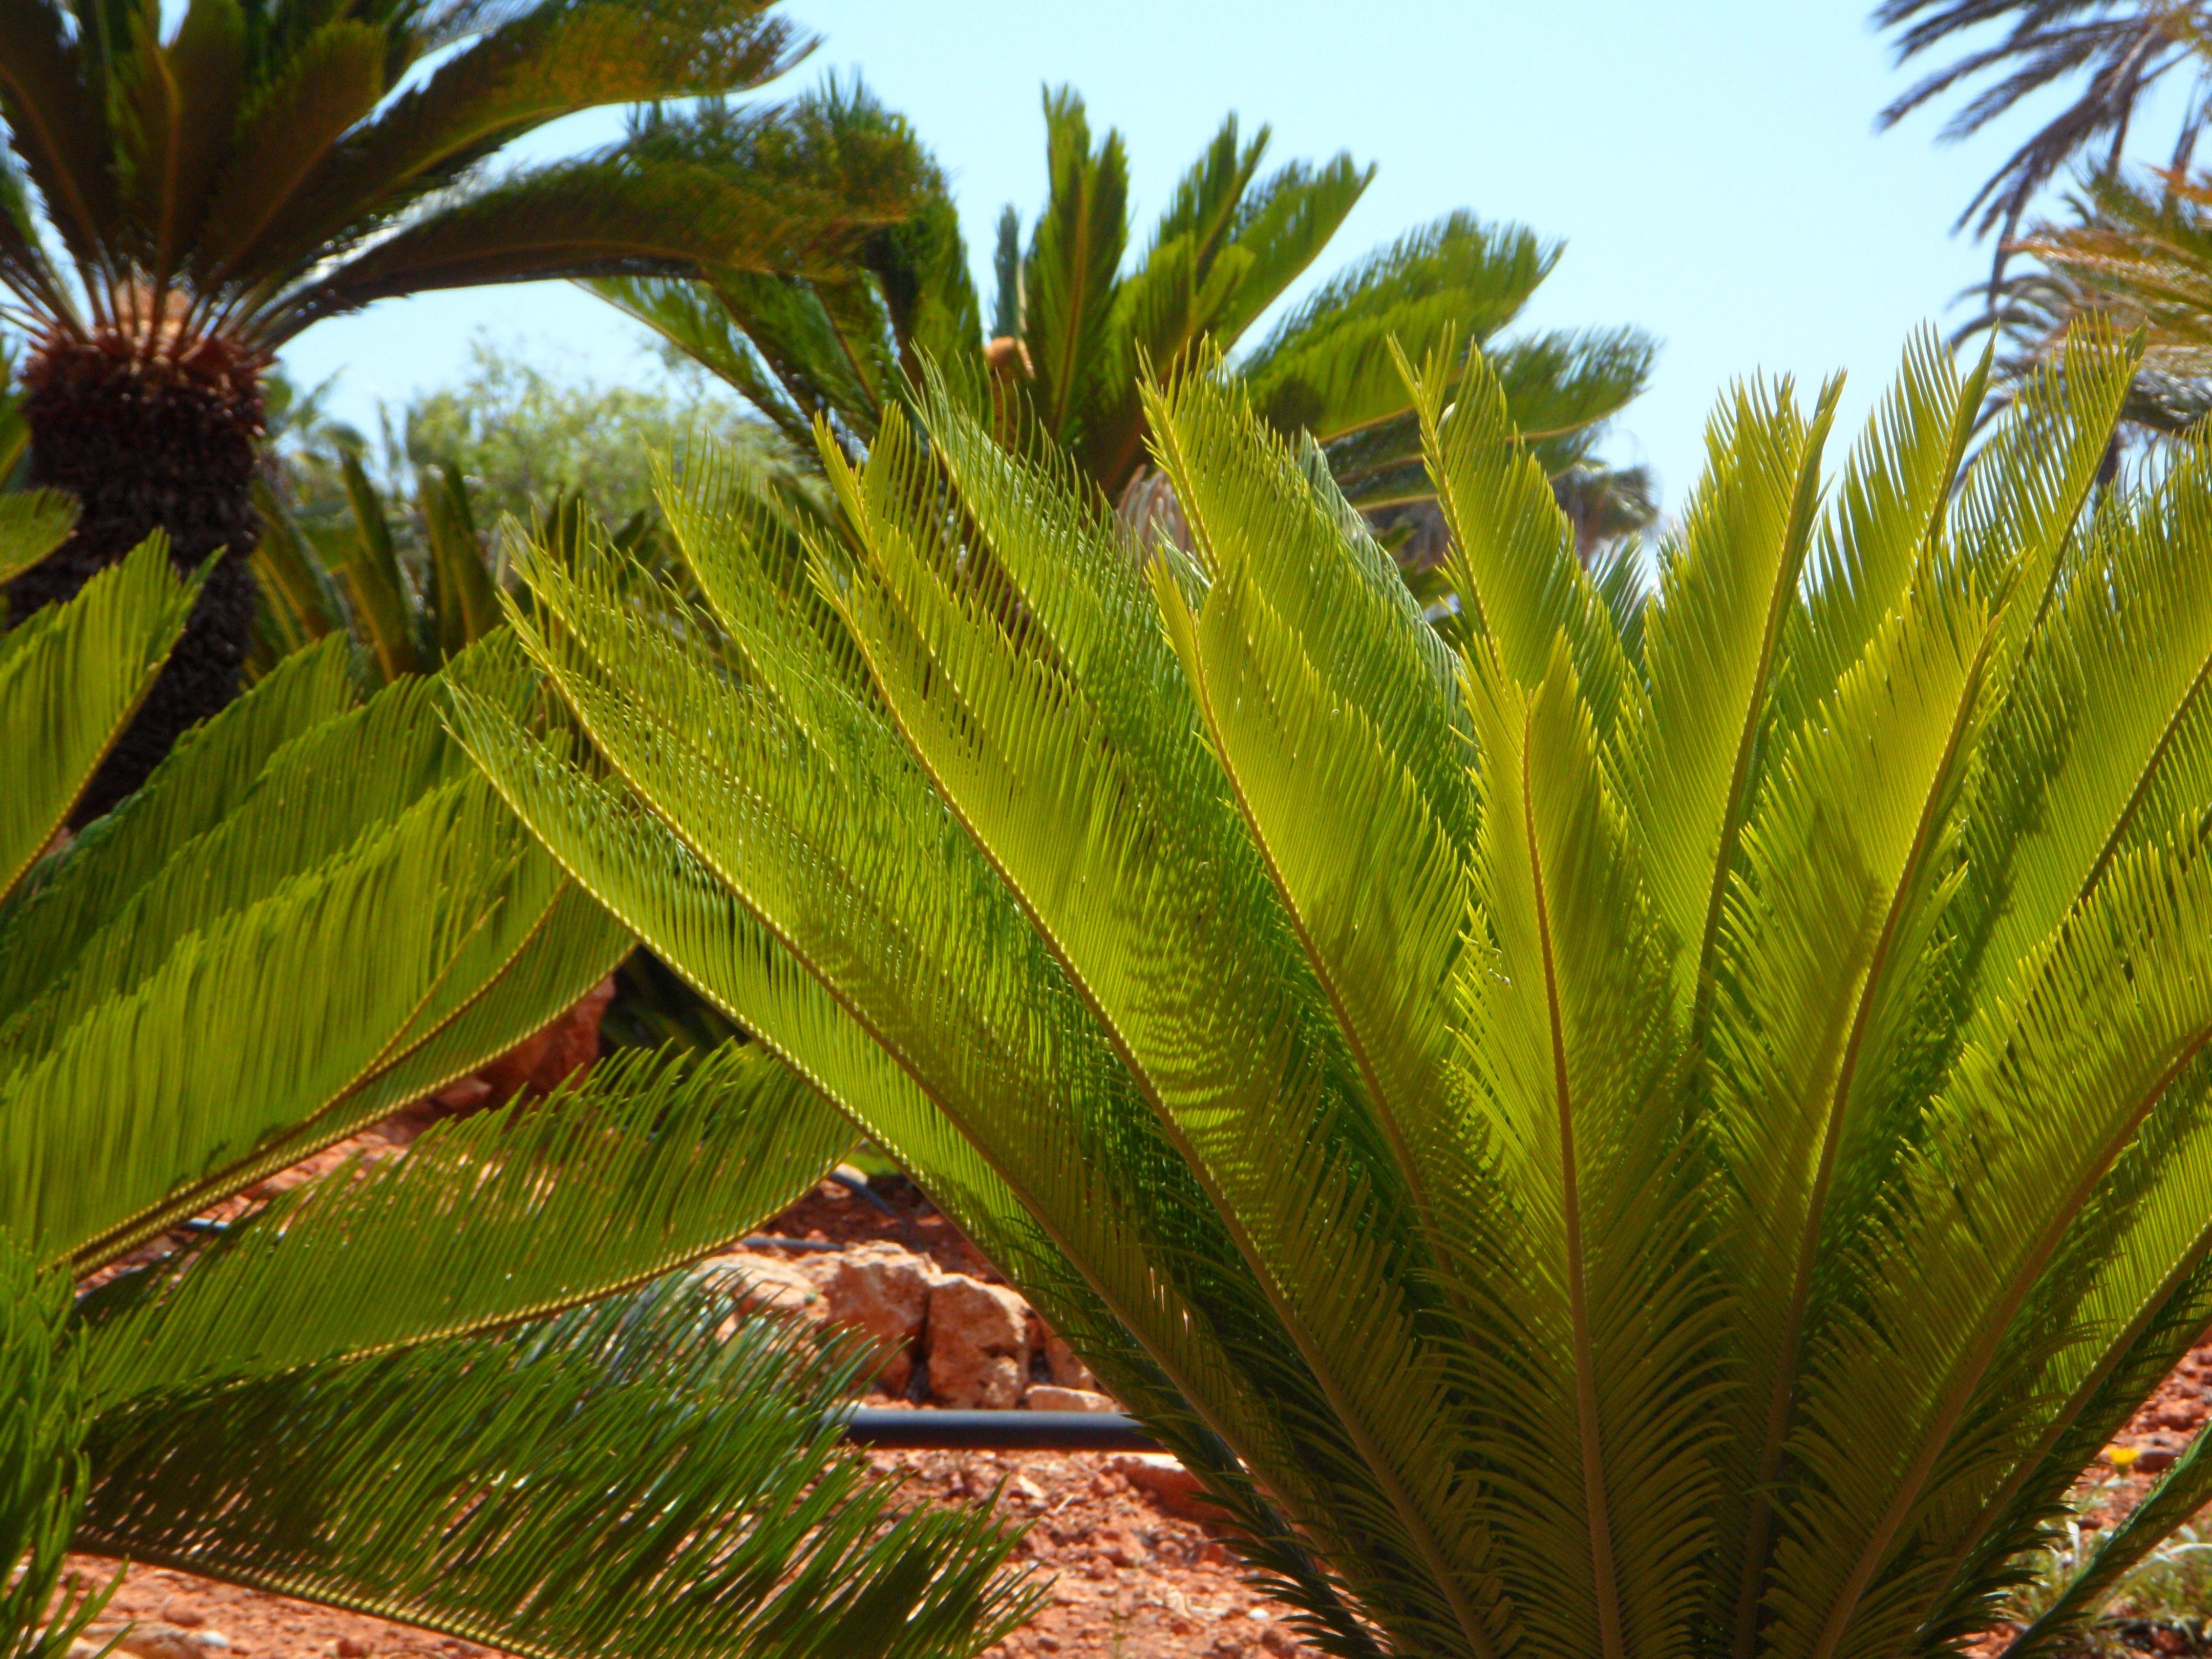 Fotos gratis rbol hoja flor verde mediterr neo for Vegetacion ornamental